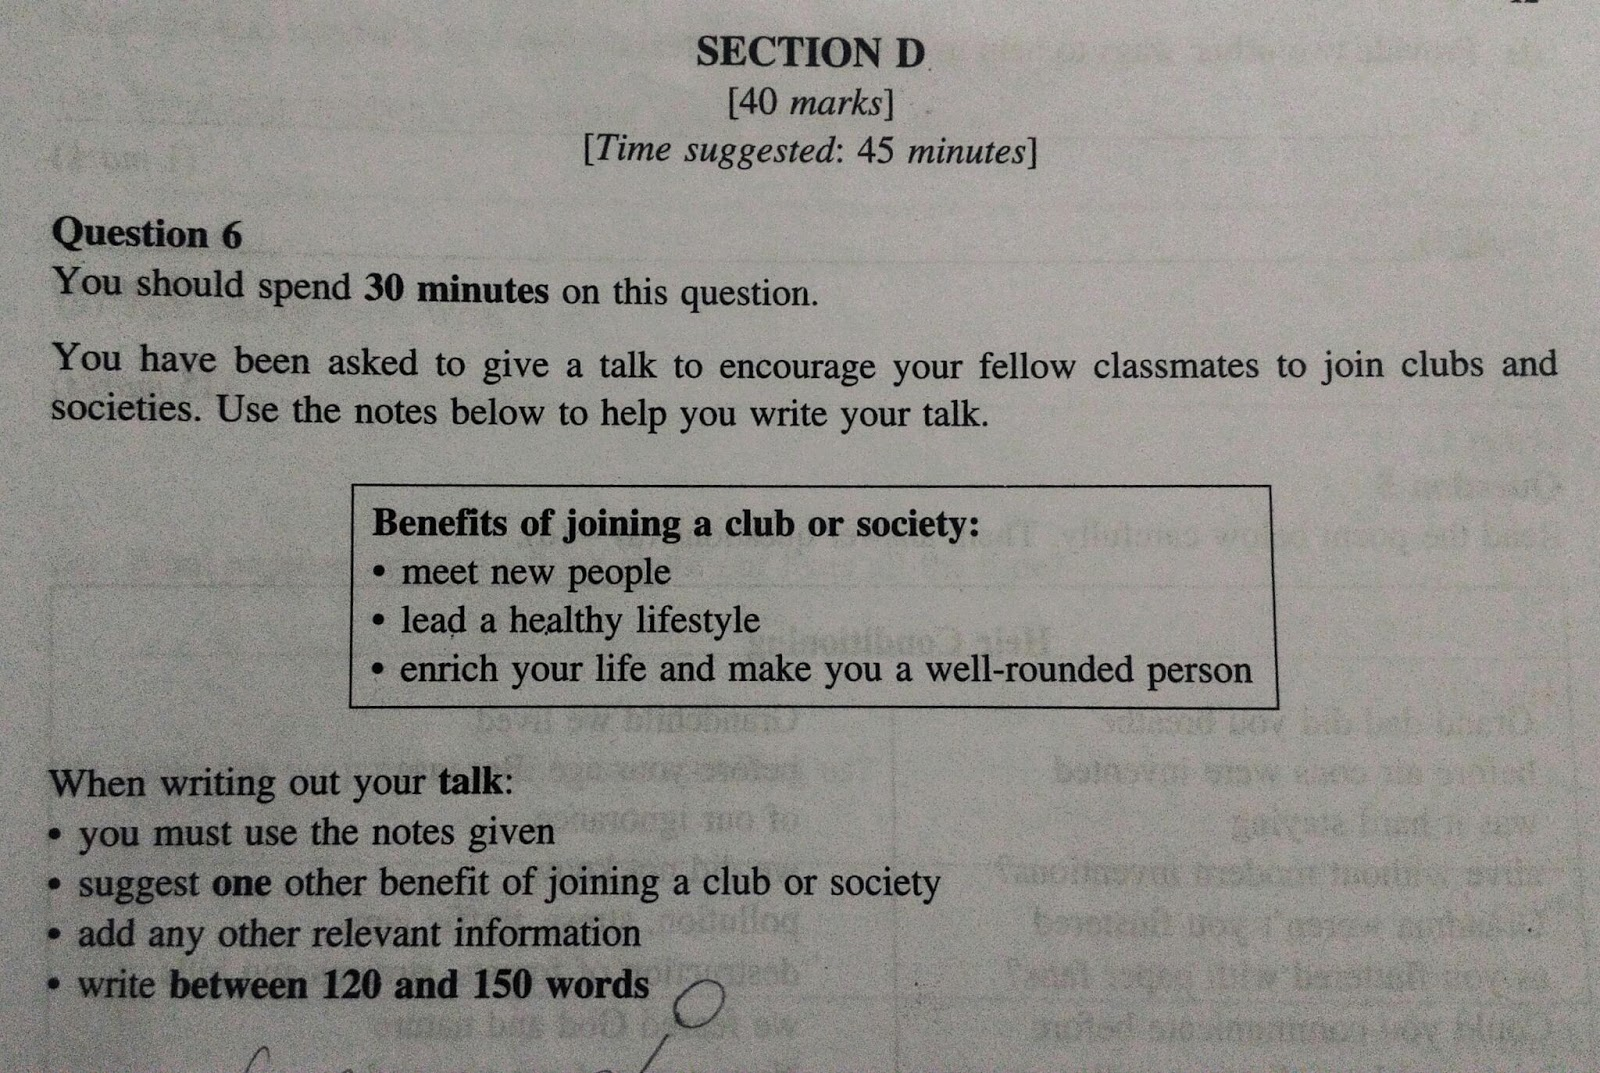 024 Definition Essays Friendship On Qualities Of Good Friend English